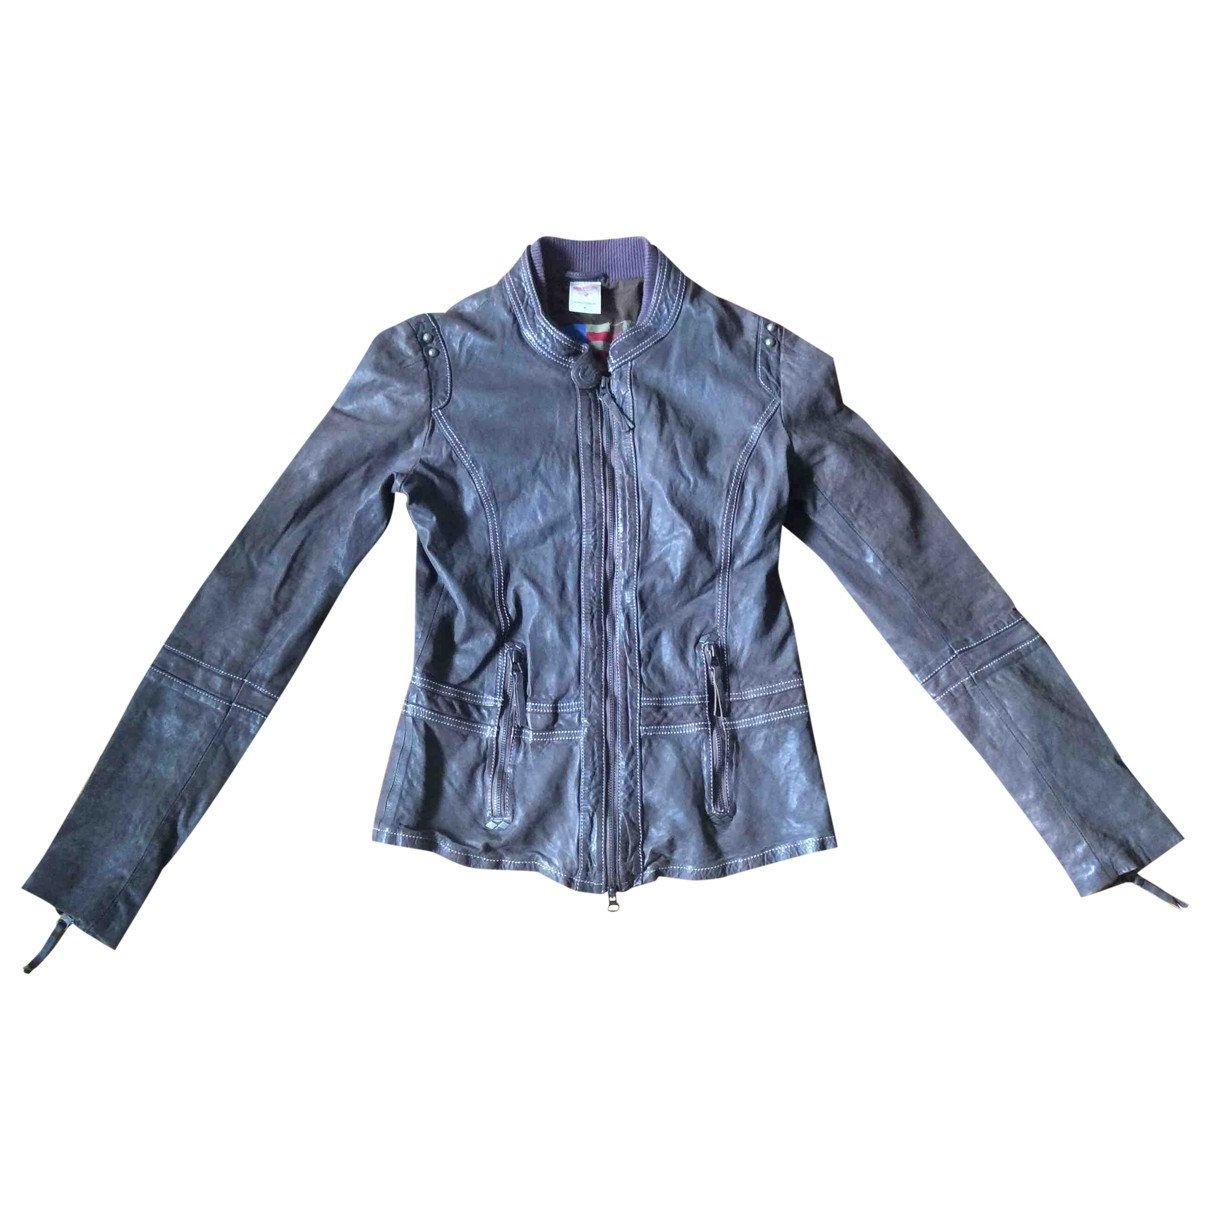 True Religion \N Brown Leather jacket for Women M International